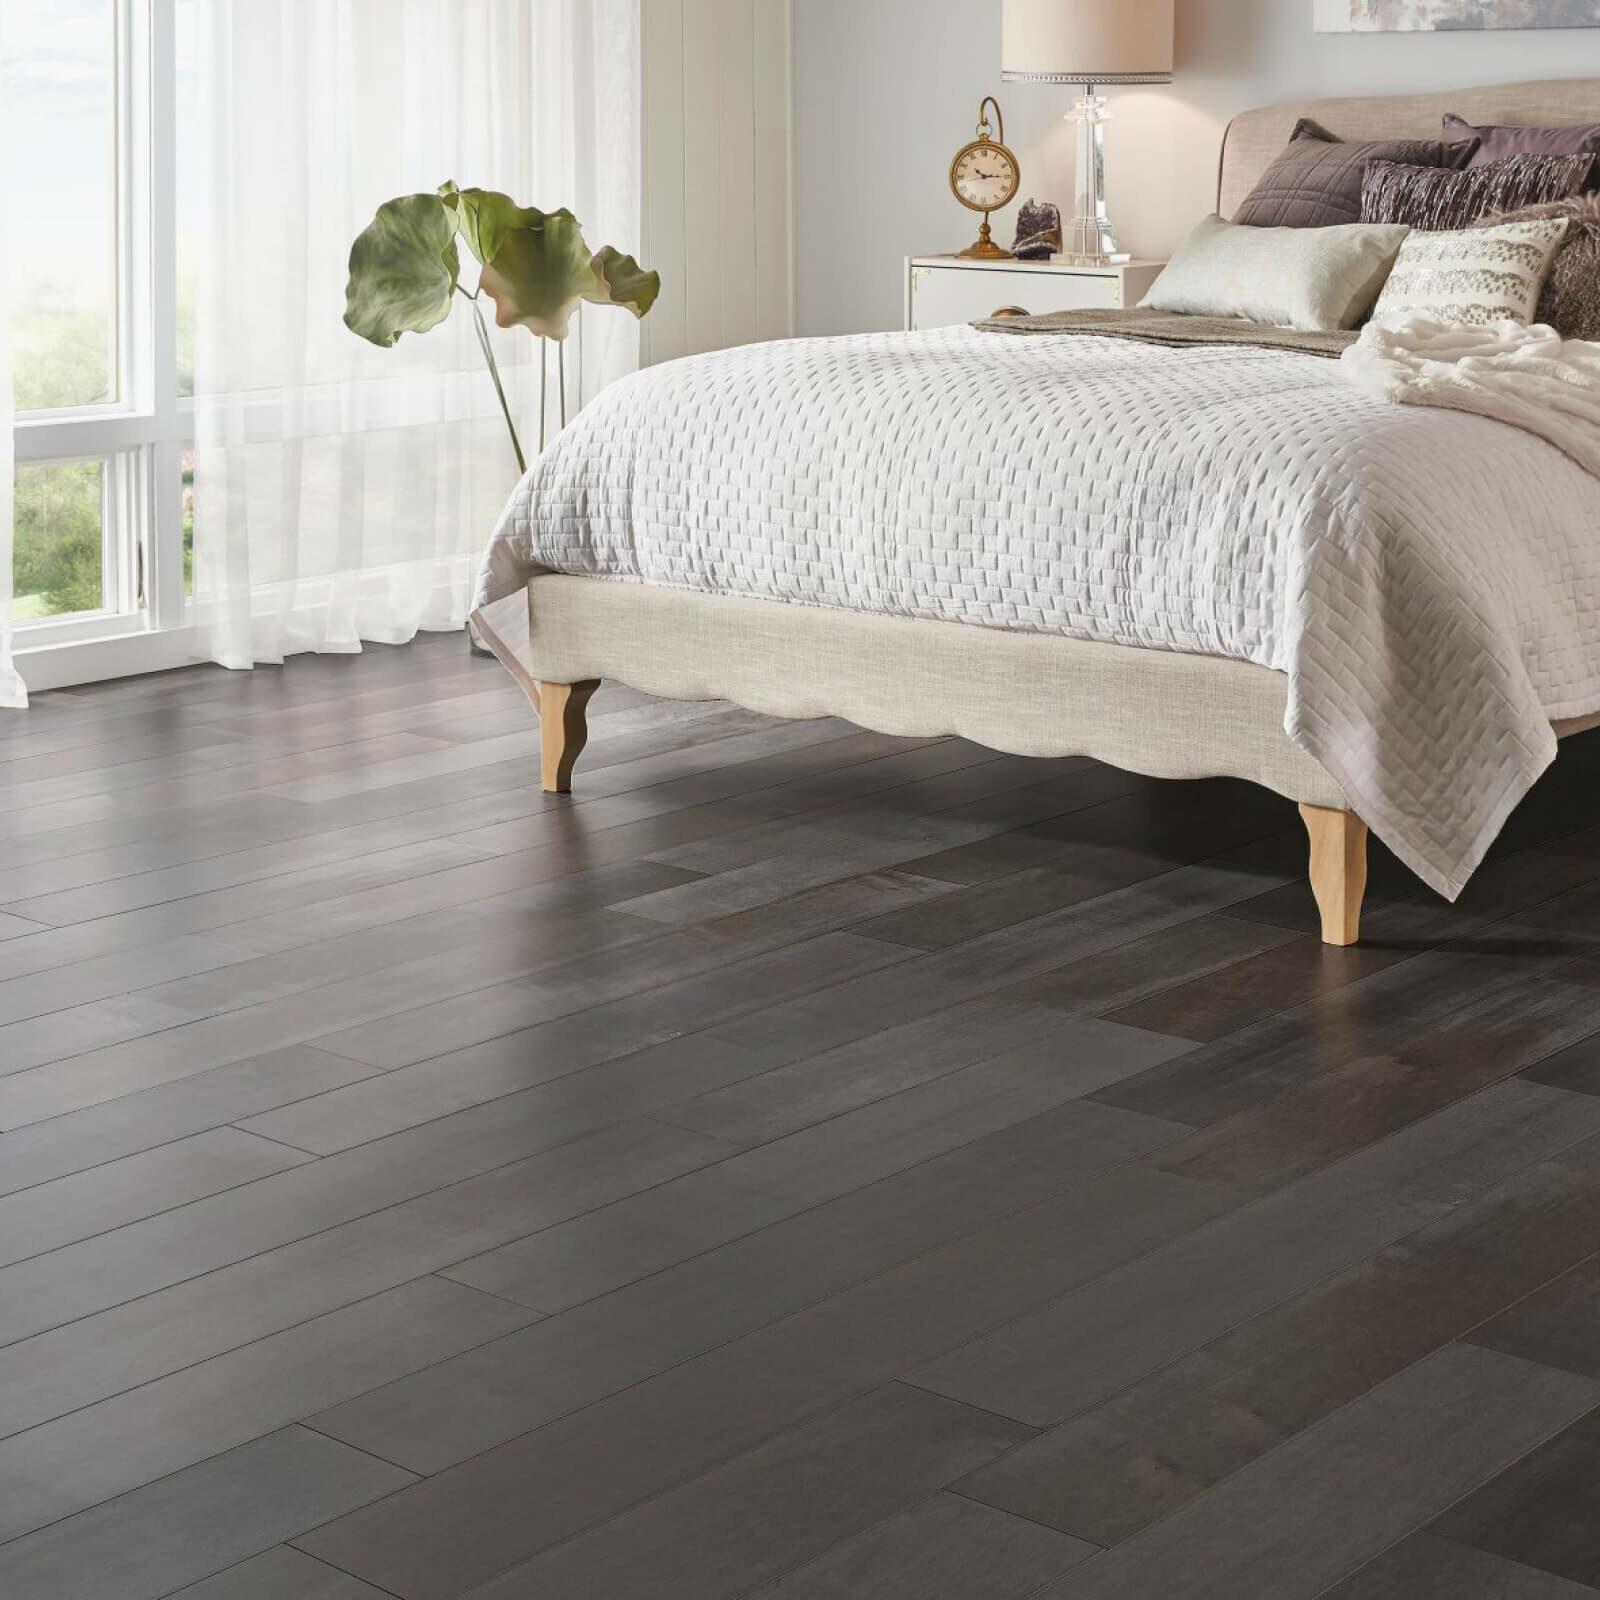 Bedroom hardwood flooring | Dalton Flooring Outlet